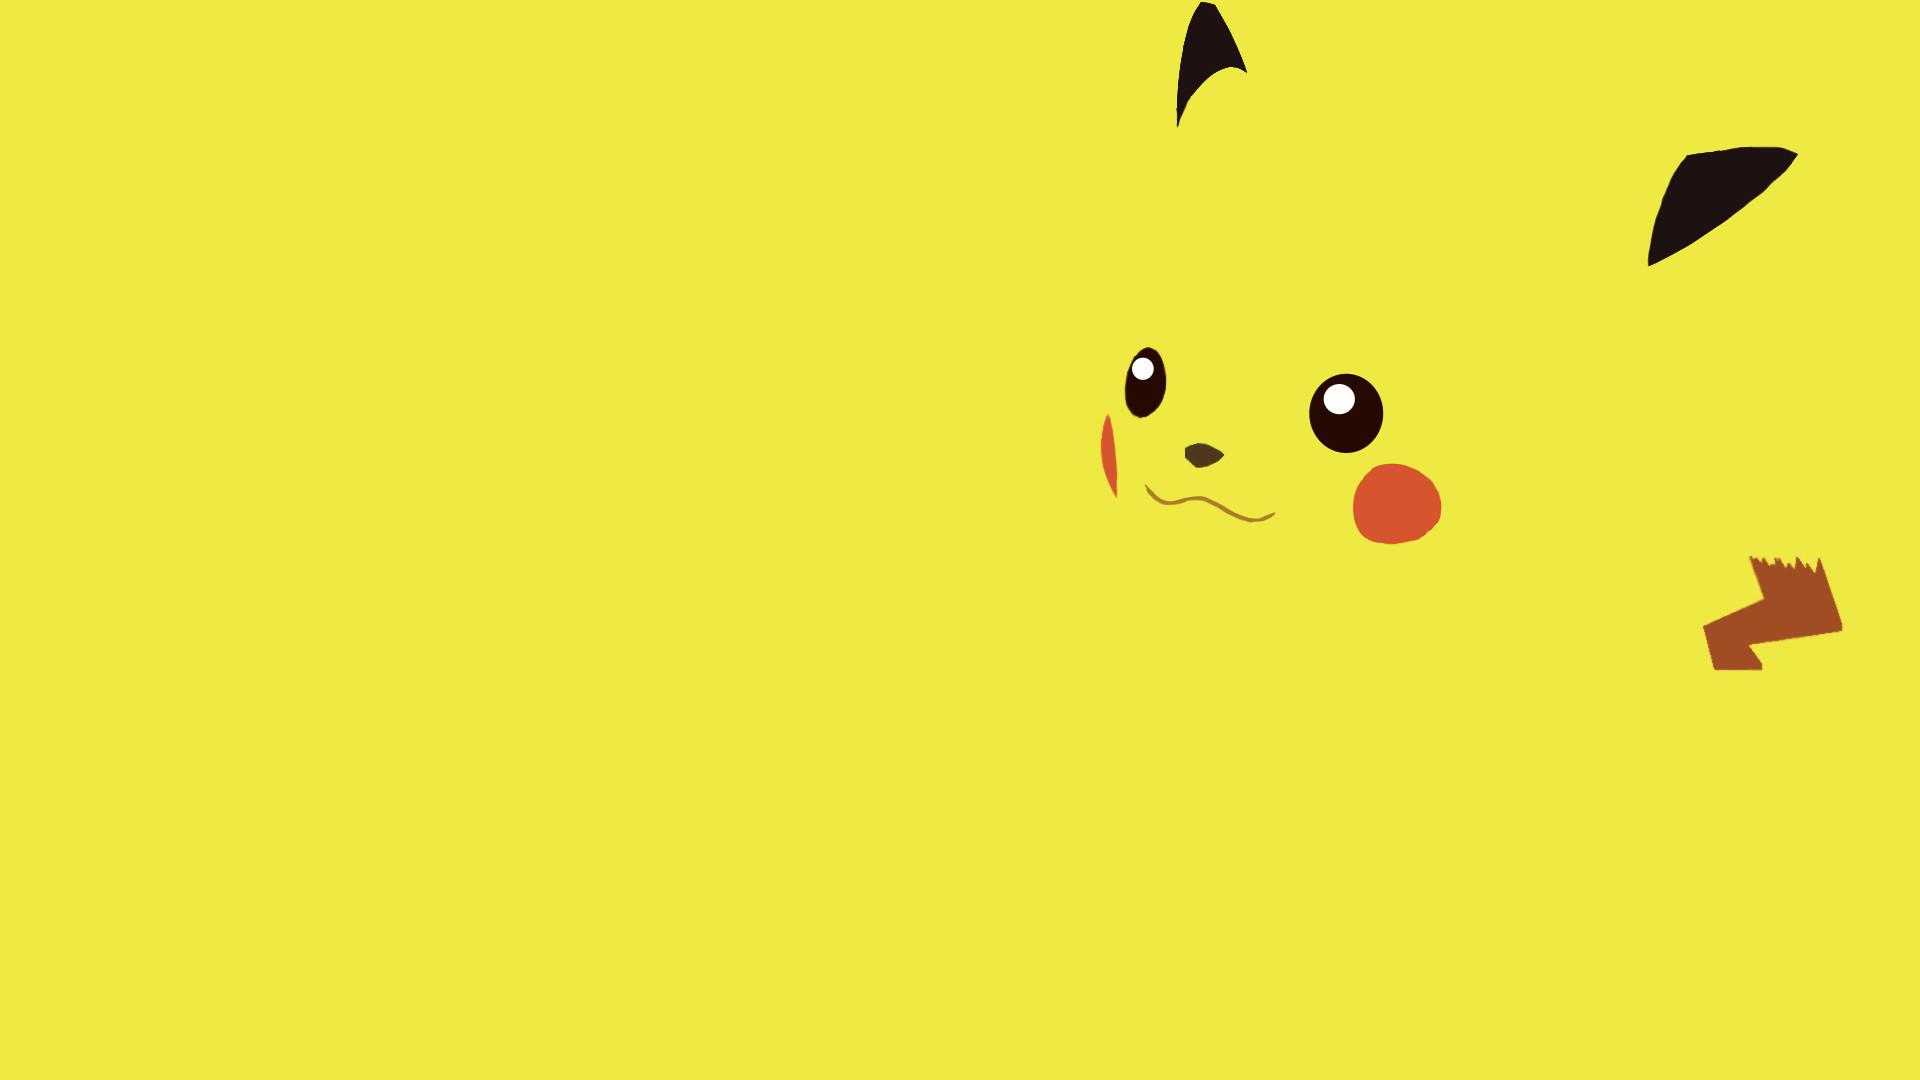 Res: 1920x1080, Cute Pokemon Wallpaper High Definition 1684 HD